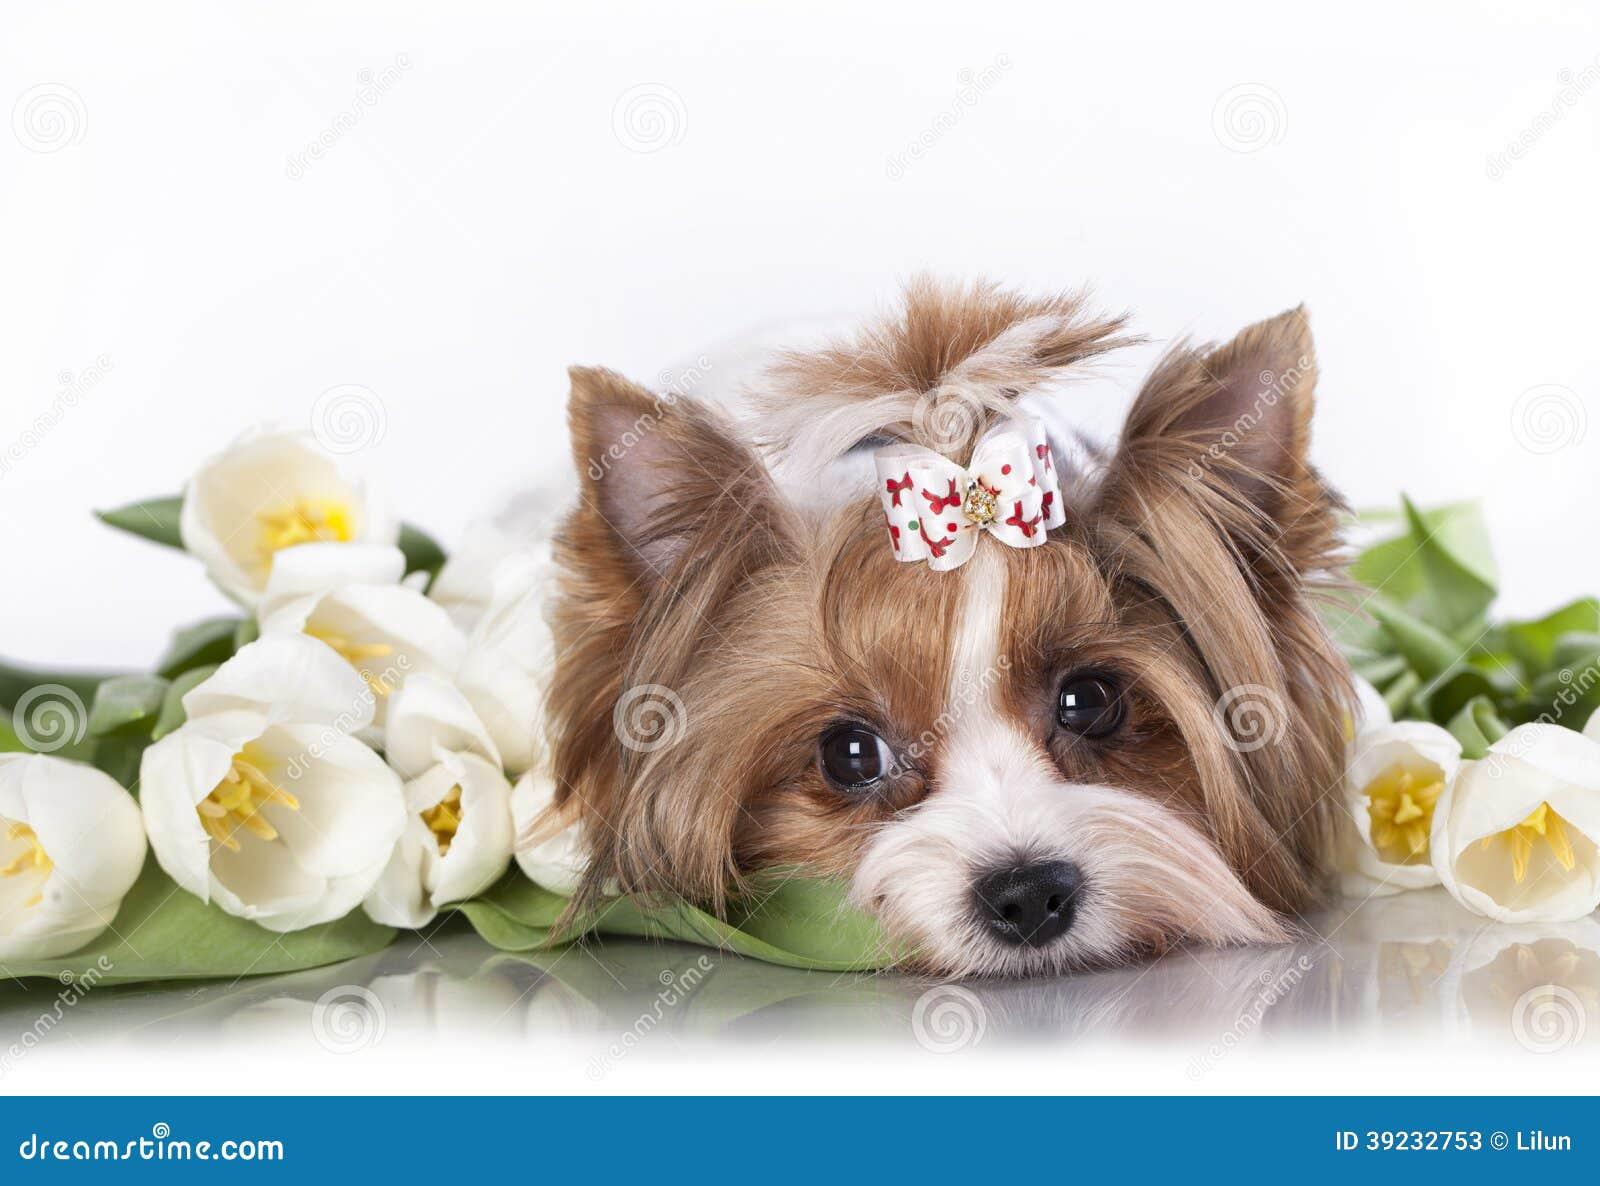 biewer狗约克和白色郁金香.图片